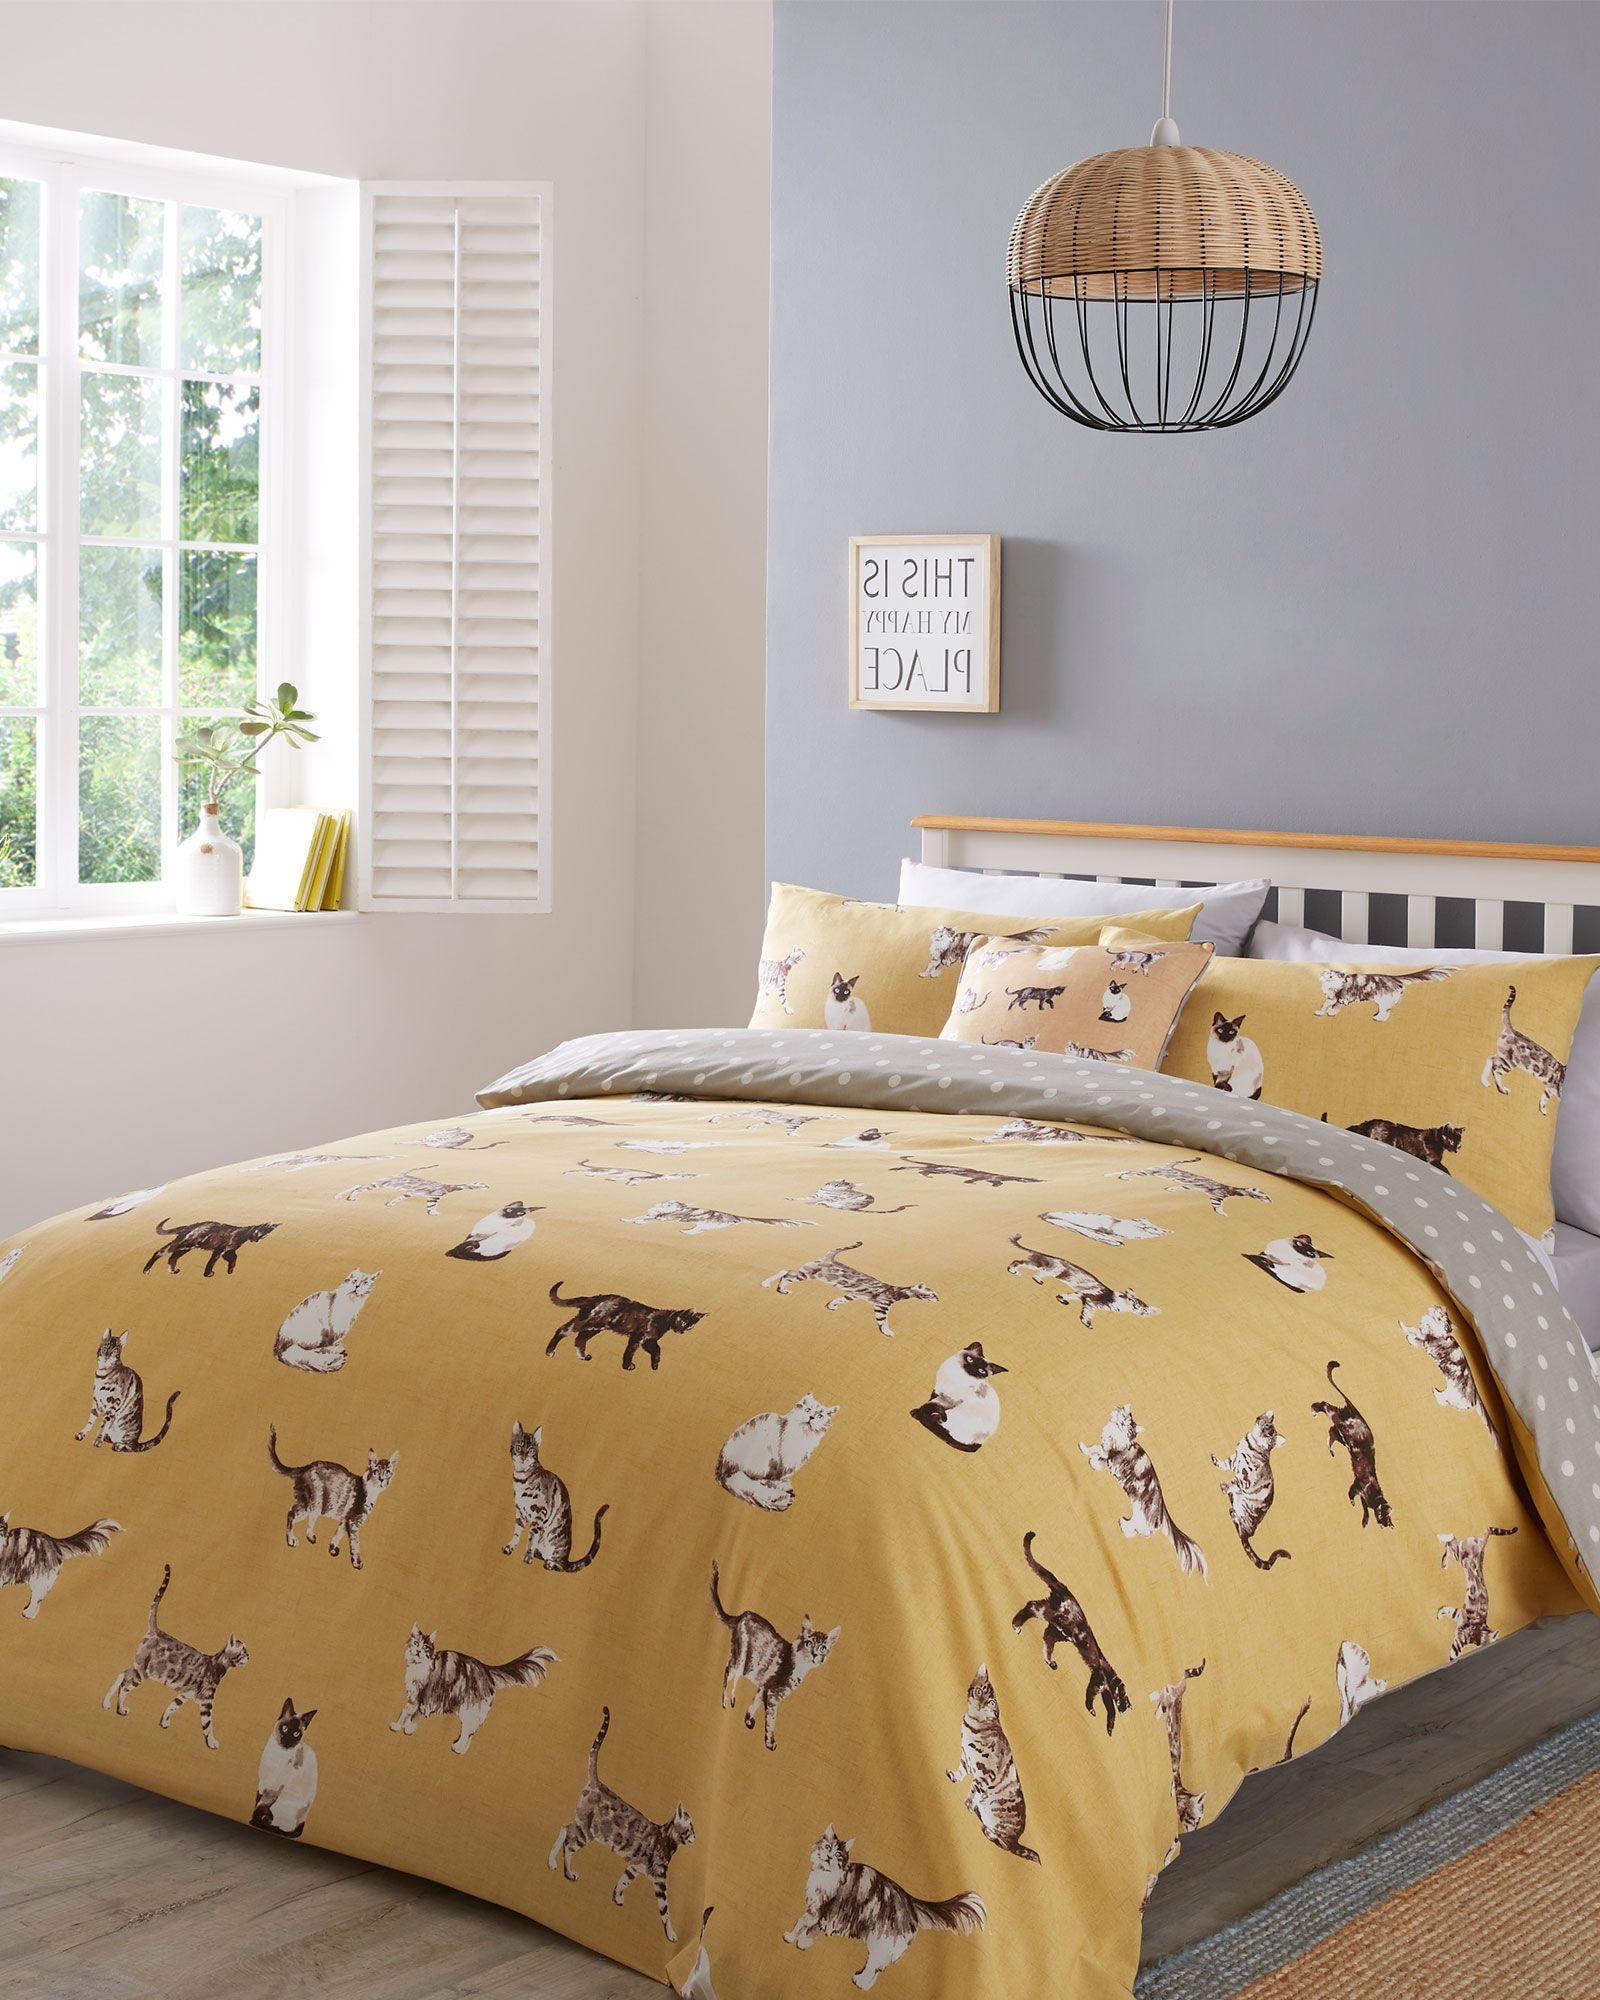 HARTLEY CHECK QUILT COVER Duvet Bedding Set /& Pillow Case Polycotton All Sizes